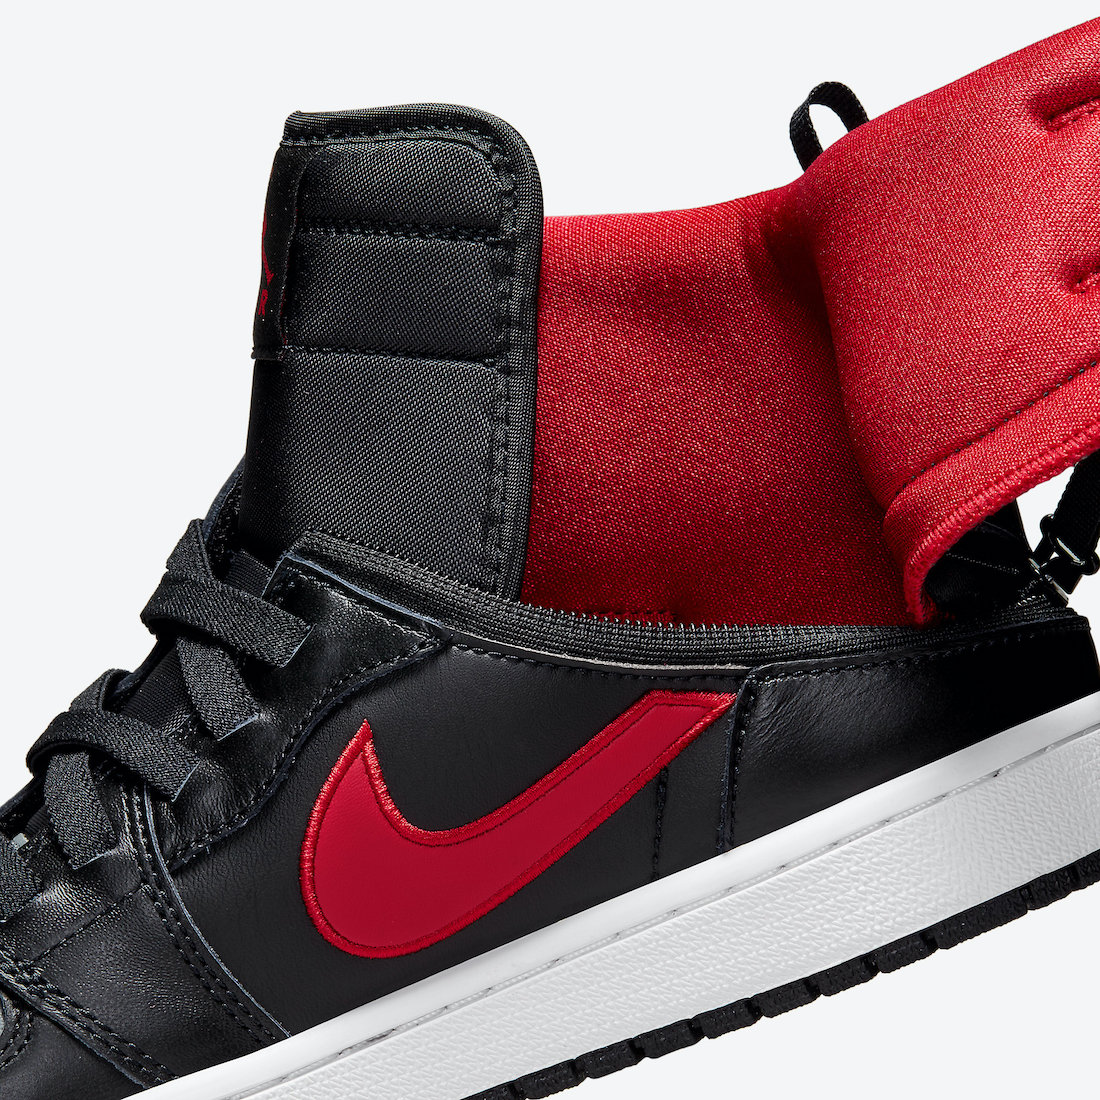 NIKE, Jordan Brand, Jordan, Air Jordan 1, Air Jordan